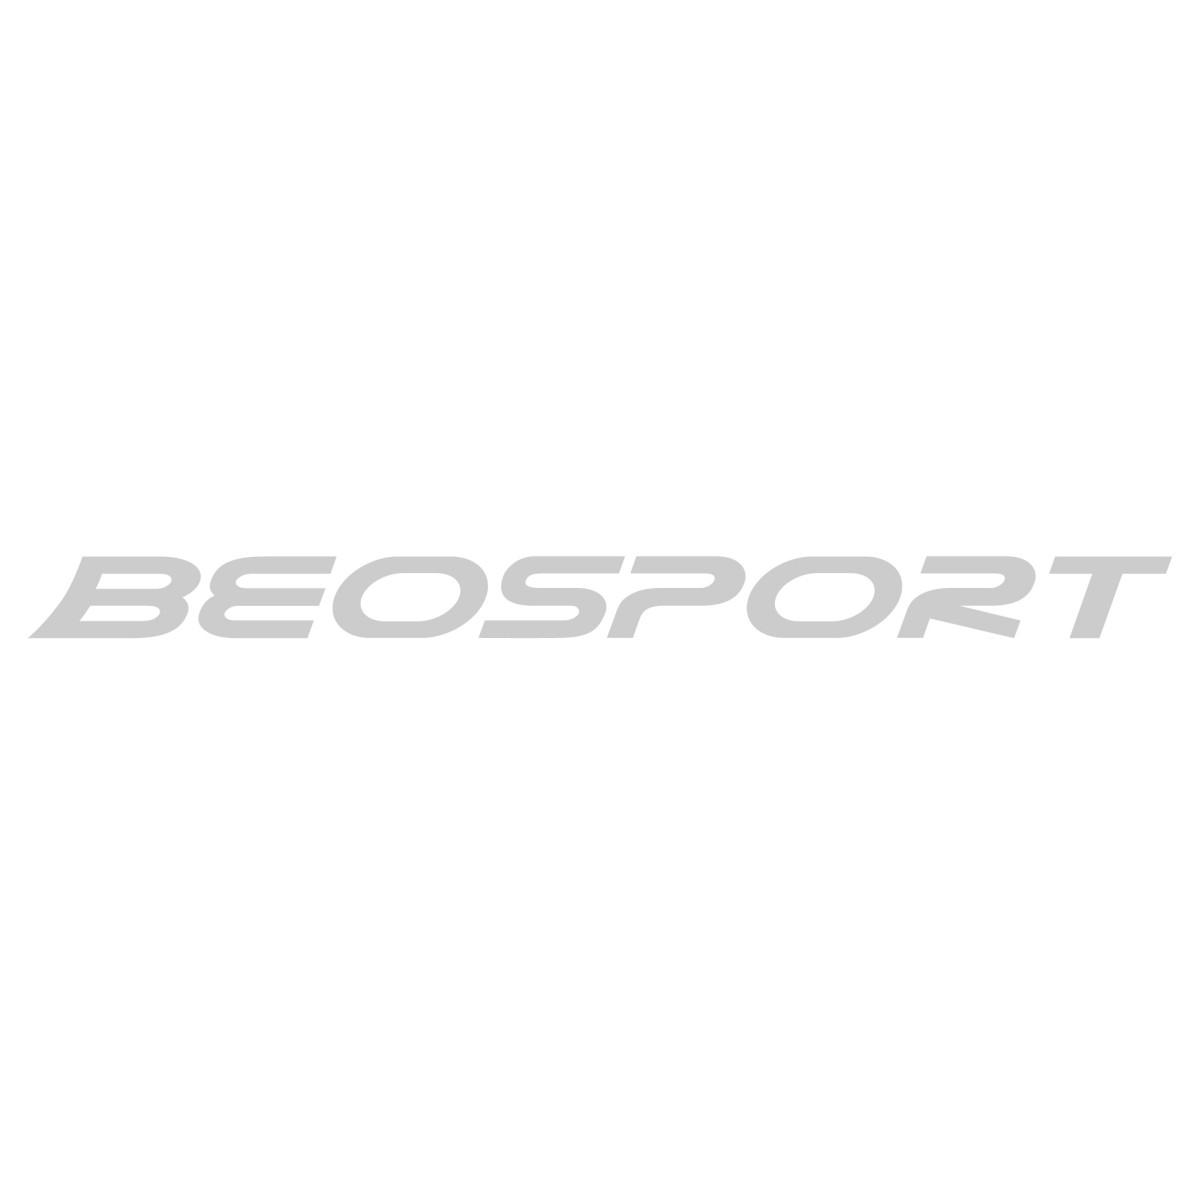 Wilson G Team II majica